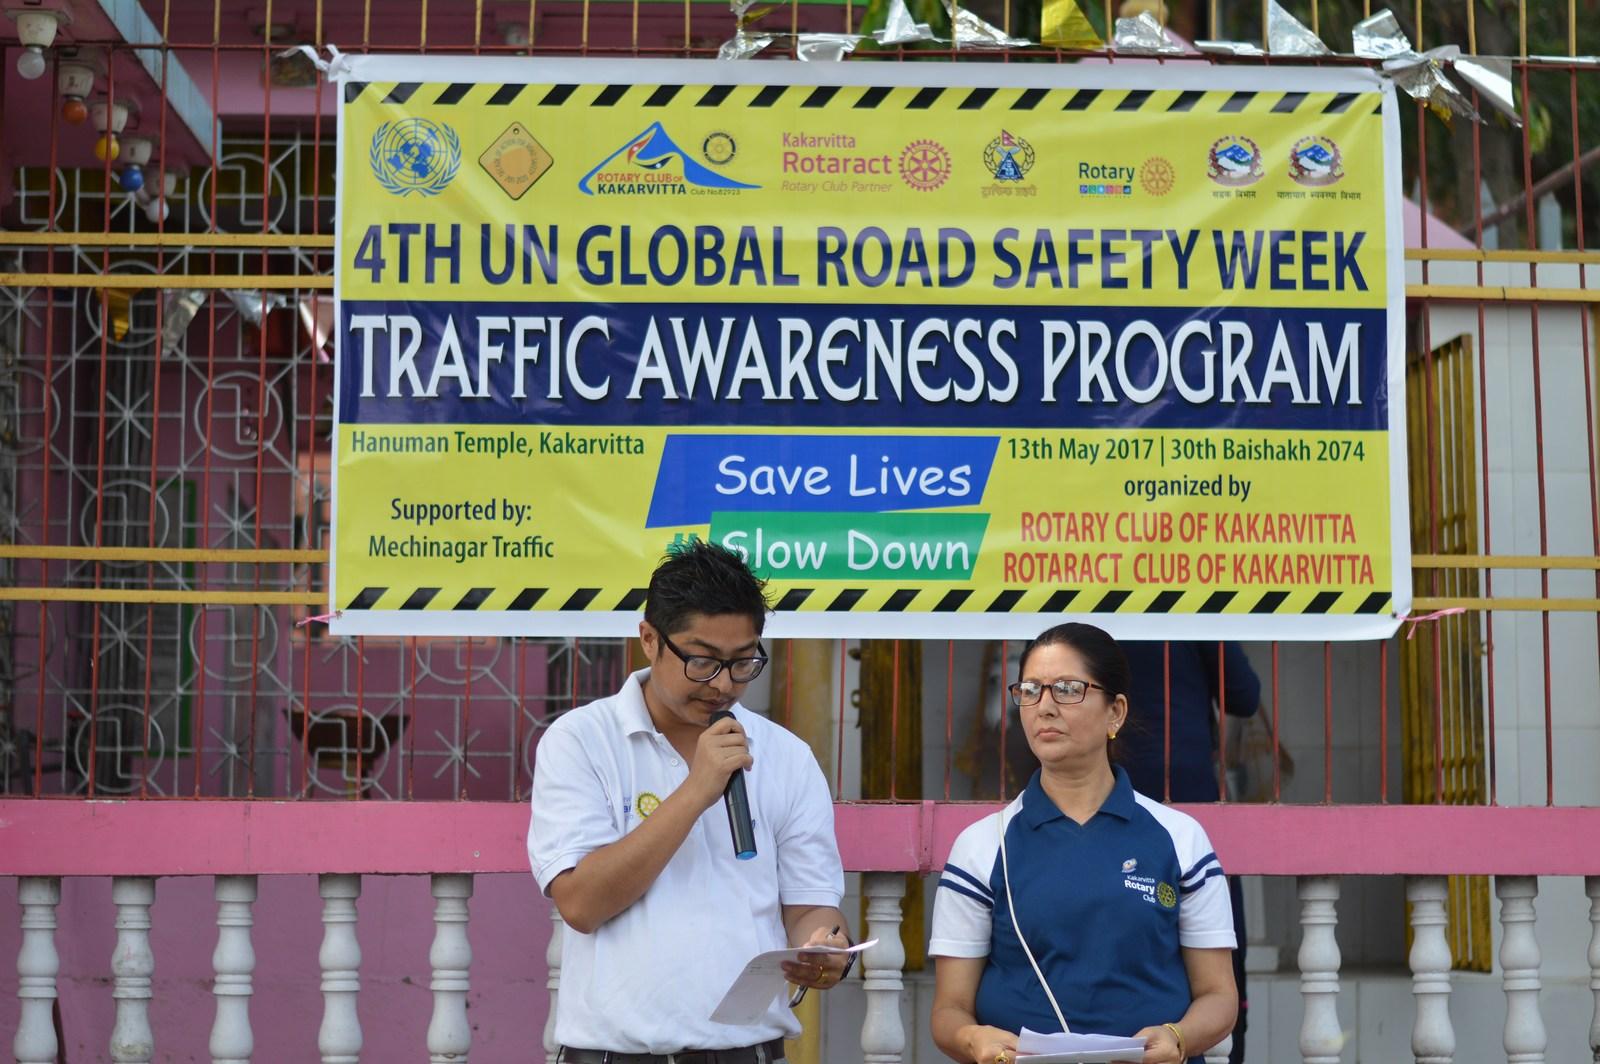 4th-UN-Global-Road-Safety-Week-2017-Traffic-Awareness-Program-Rotary-club-of-Kakarvitta-28